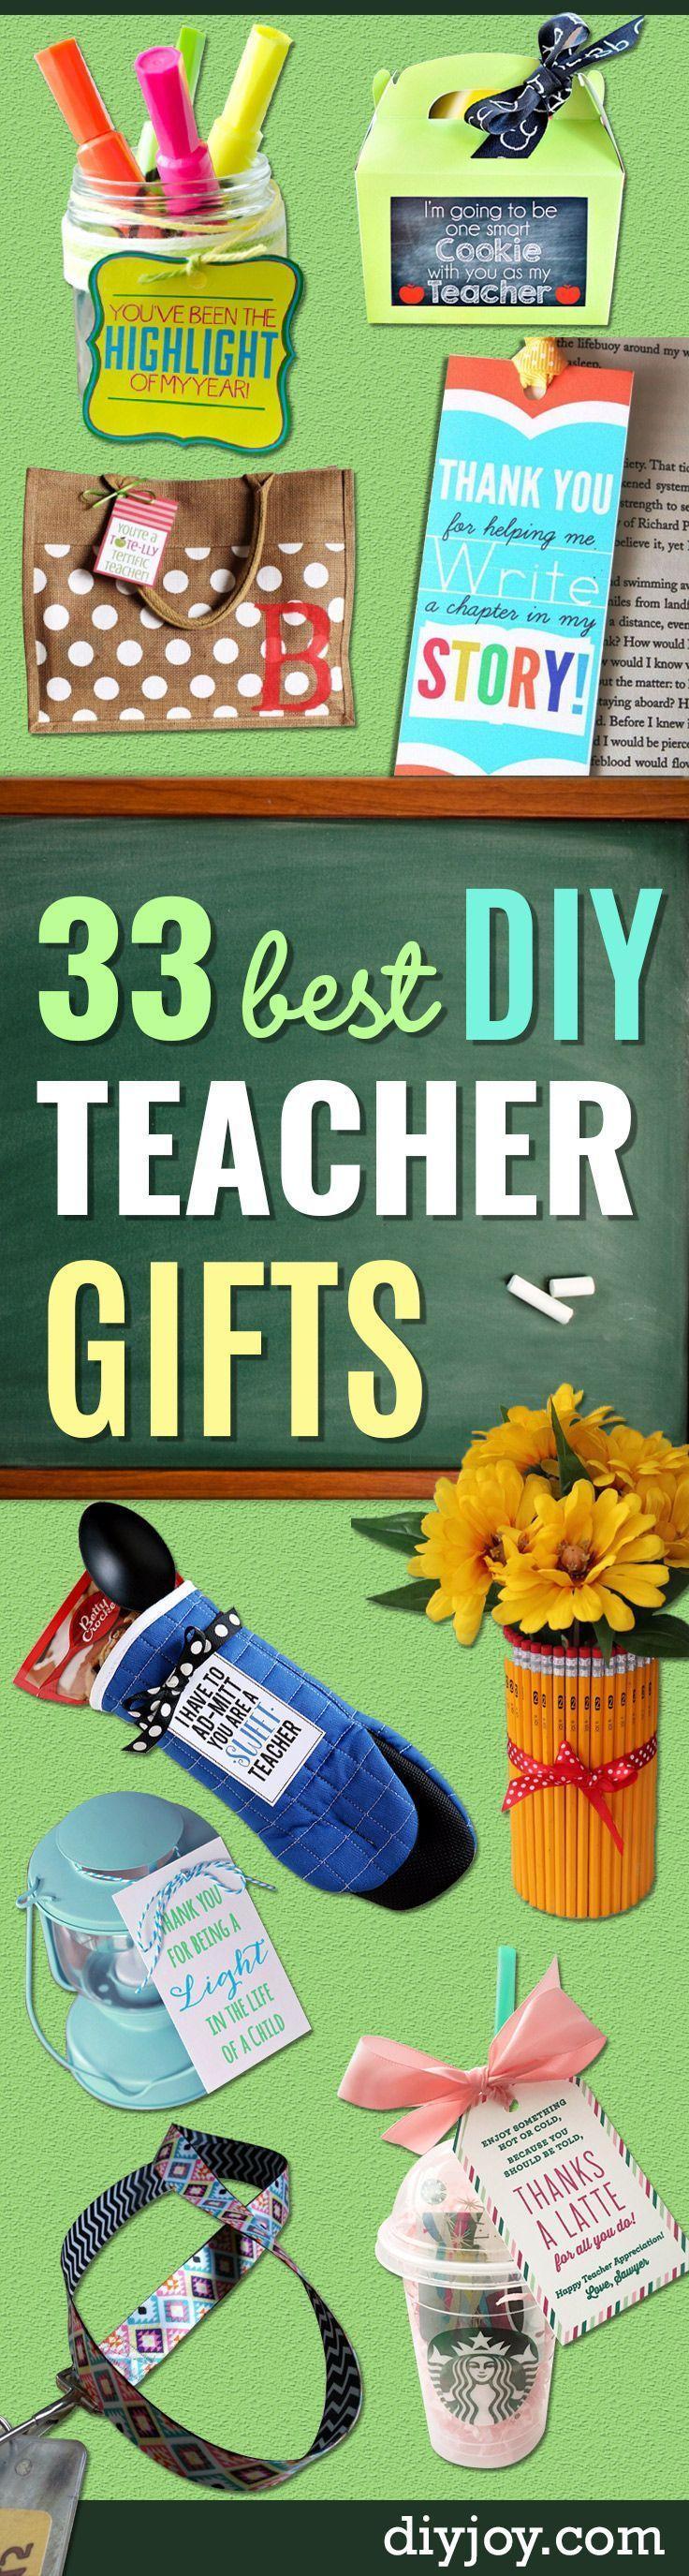 143 best Teacher Gifts images on Pinterest